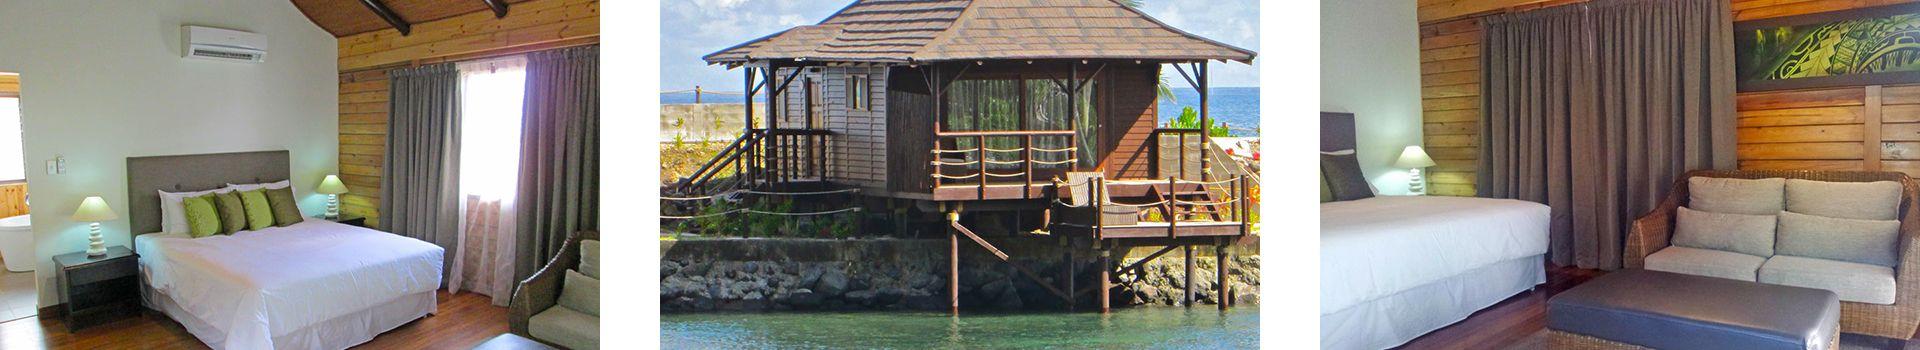 Island Villas - Aga Reef Resort - Samoa